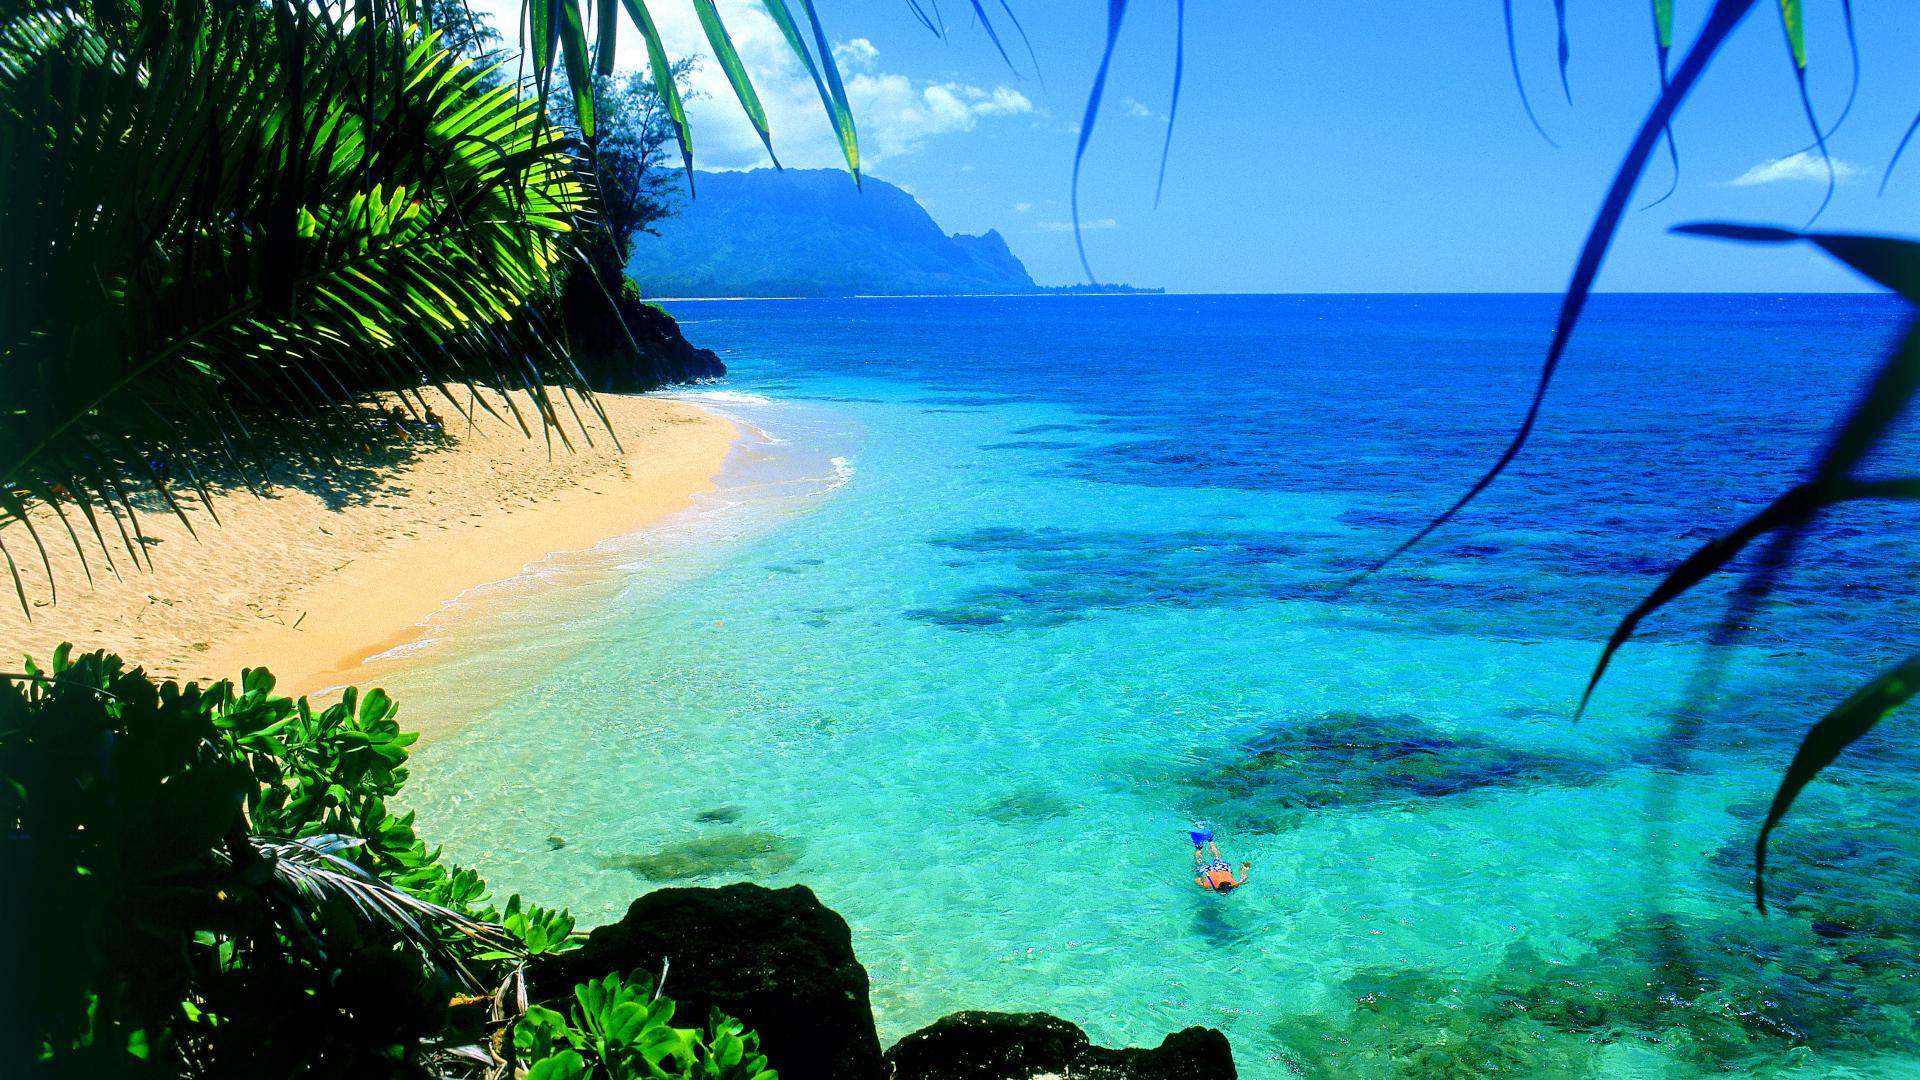 Hawaii Snorkel Travel High Definition Widescre 9284 Wallpaper 1920x1080